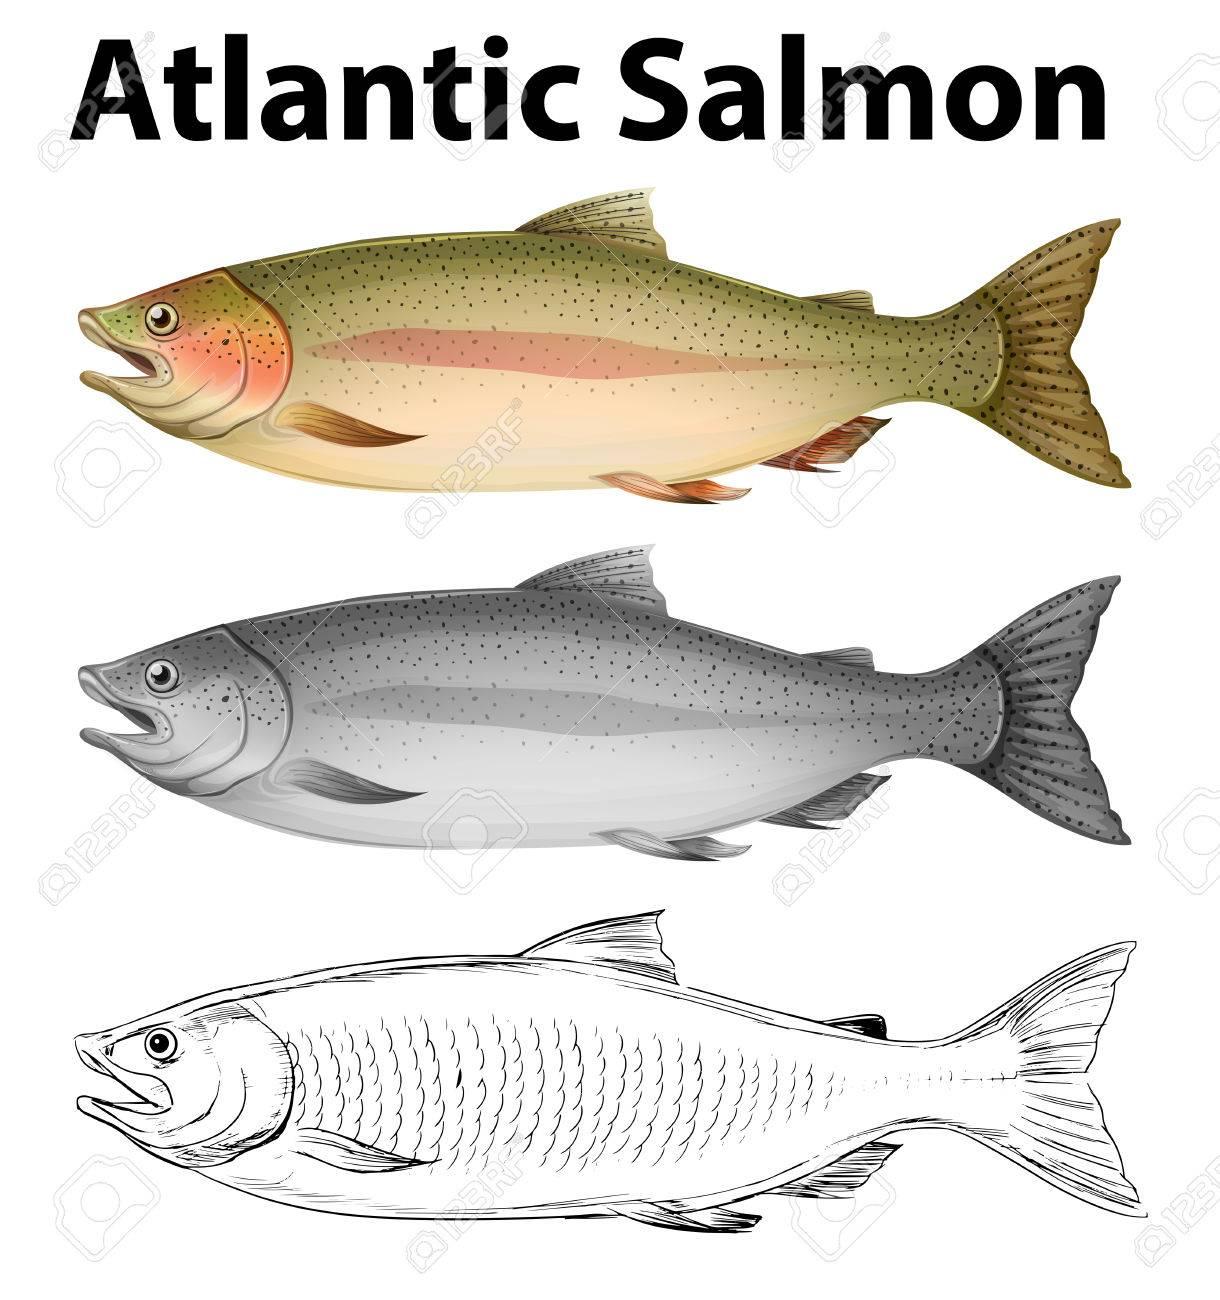 1220x1300 Three Drawing Styles Of Atlantic Salmon Illustration Royalty Free